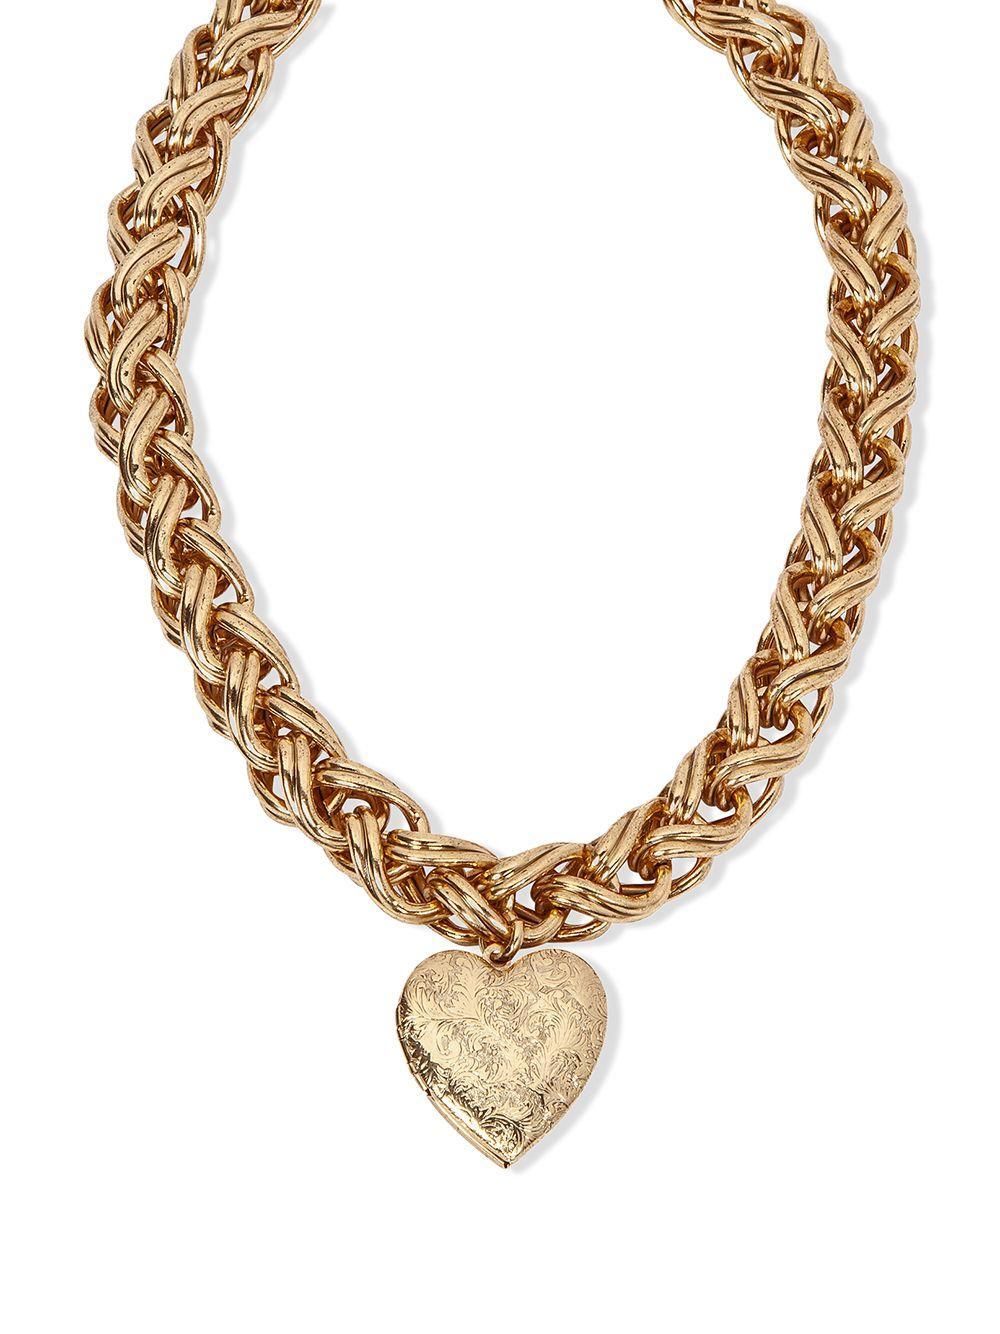 Coeur Necklace Item # 111PC5